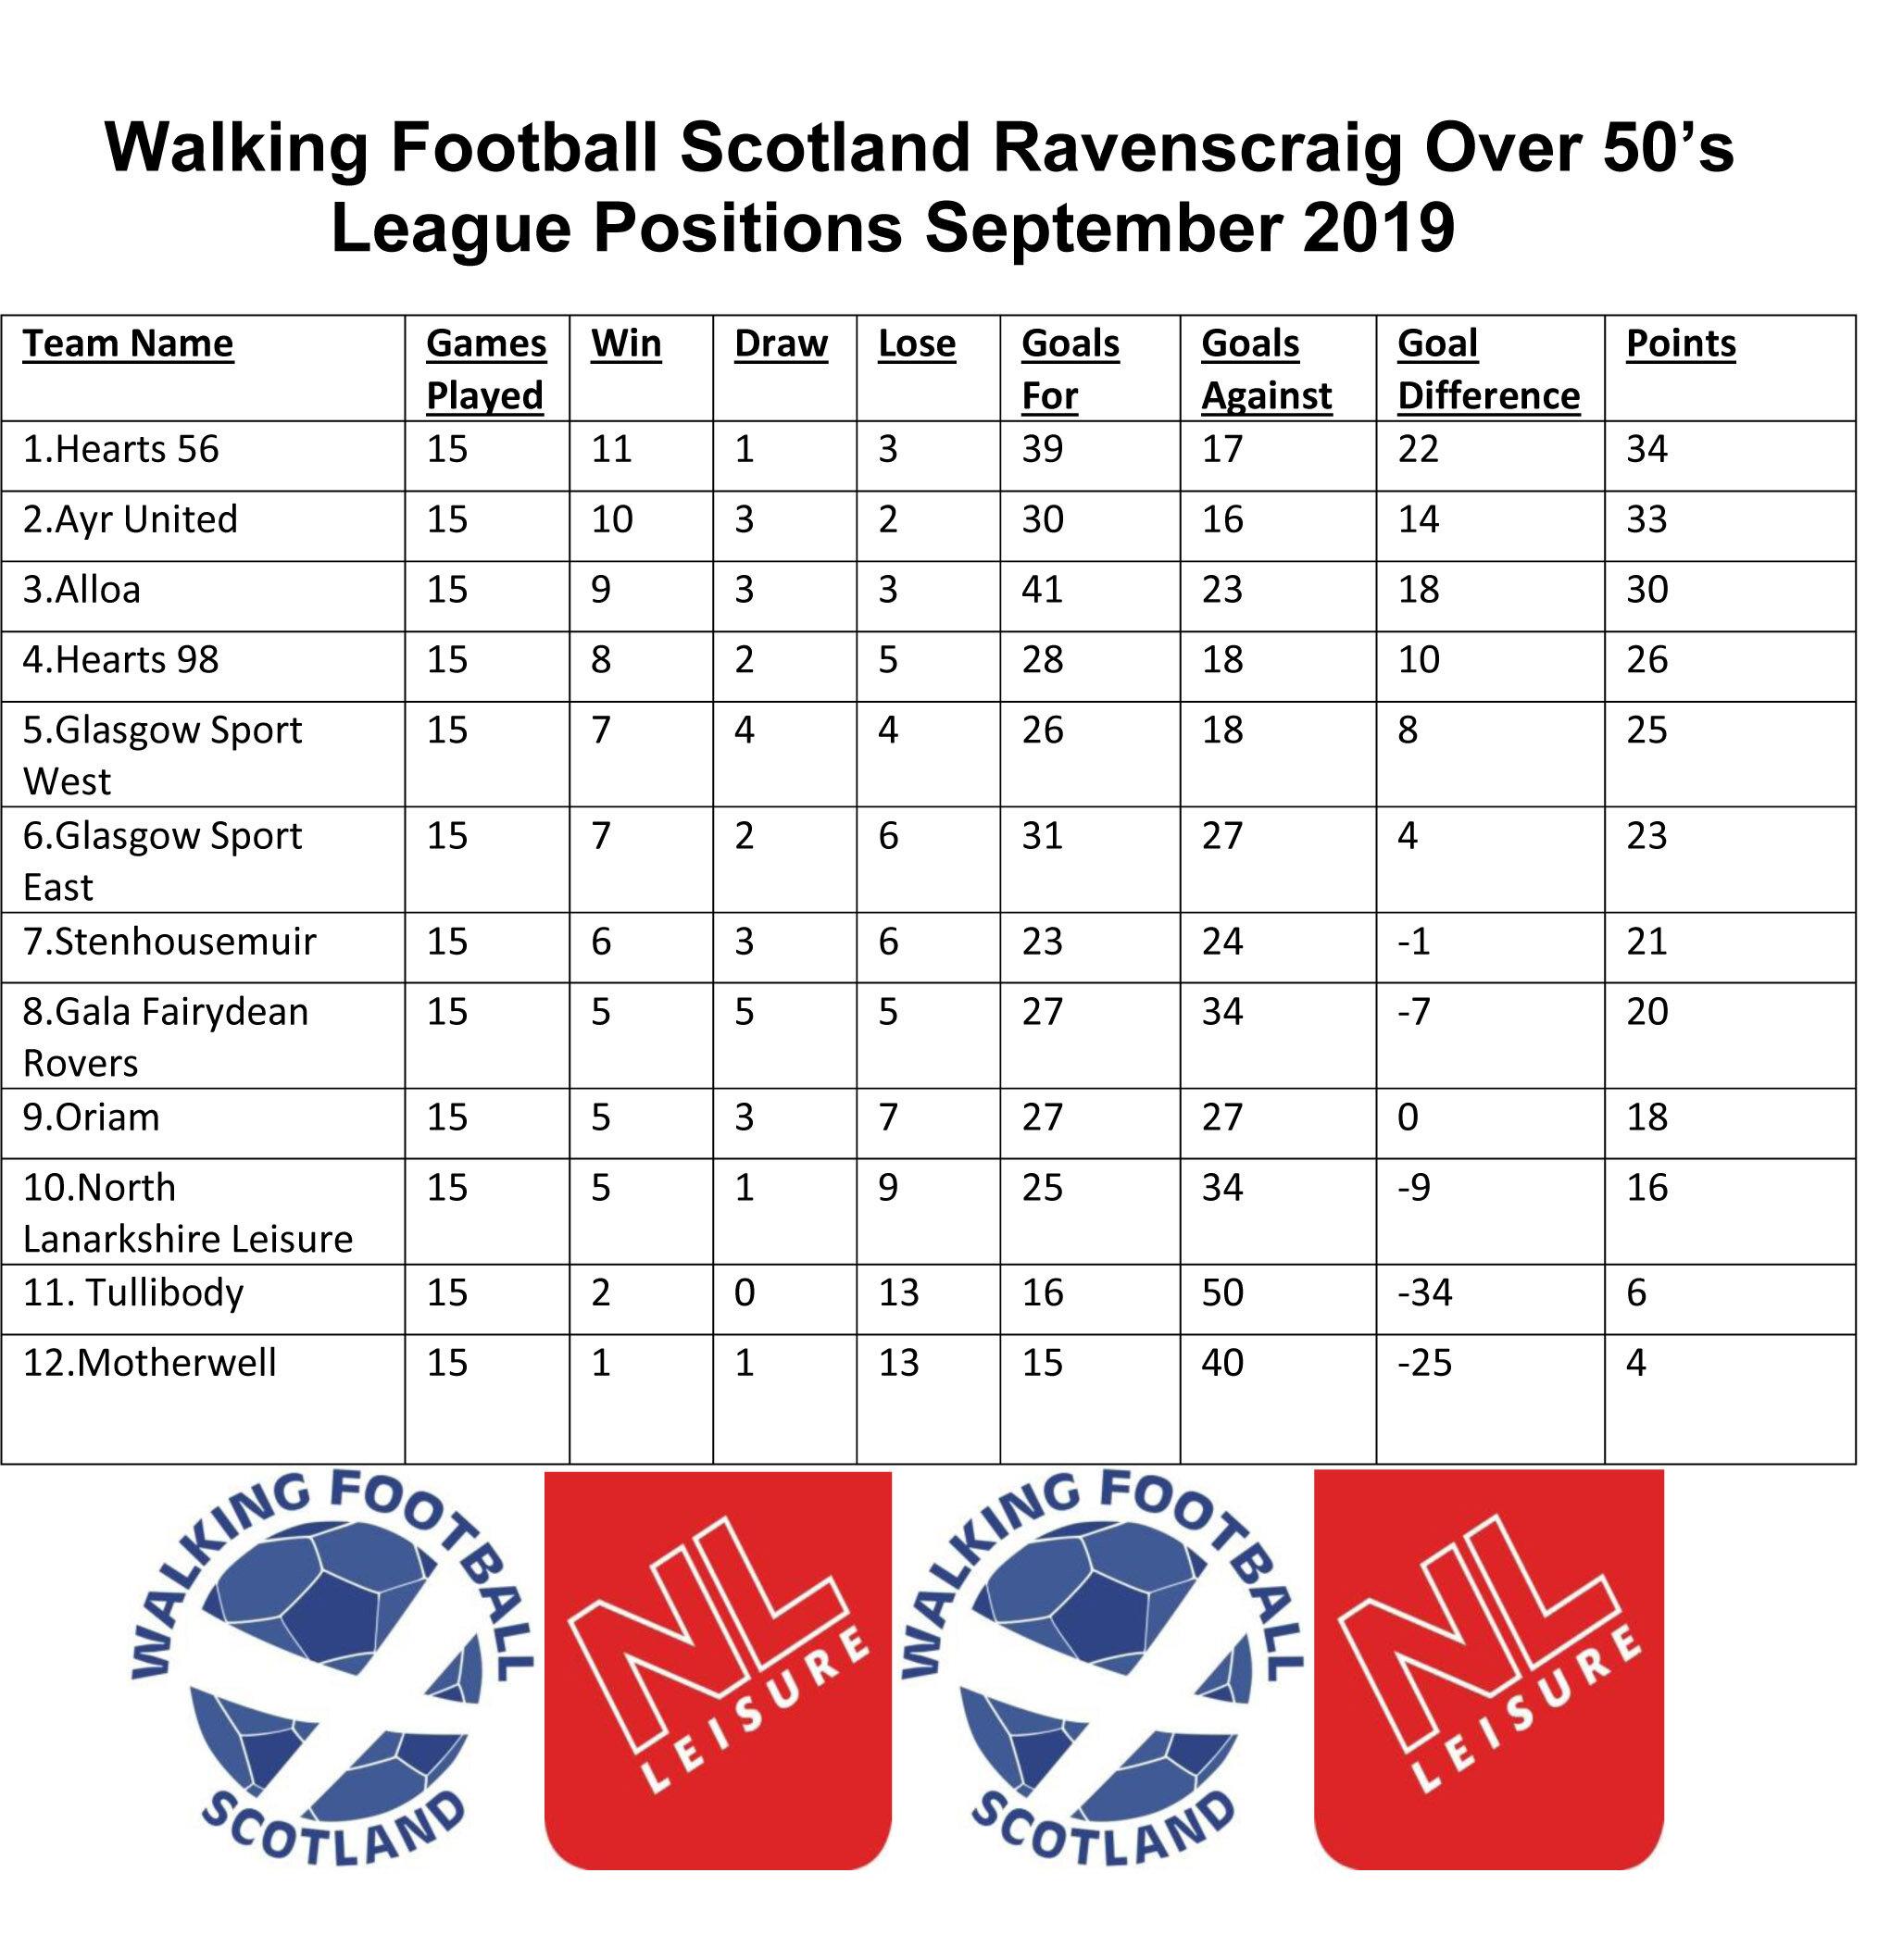 Walking Football Scotland Ravenscraig Over 50 League positions September 19.jpg